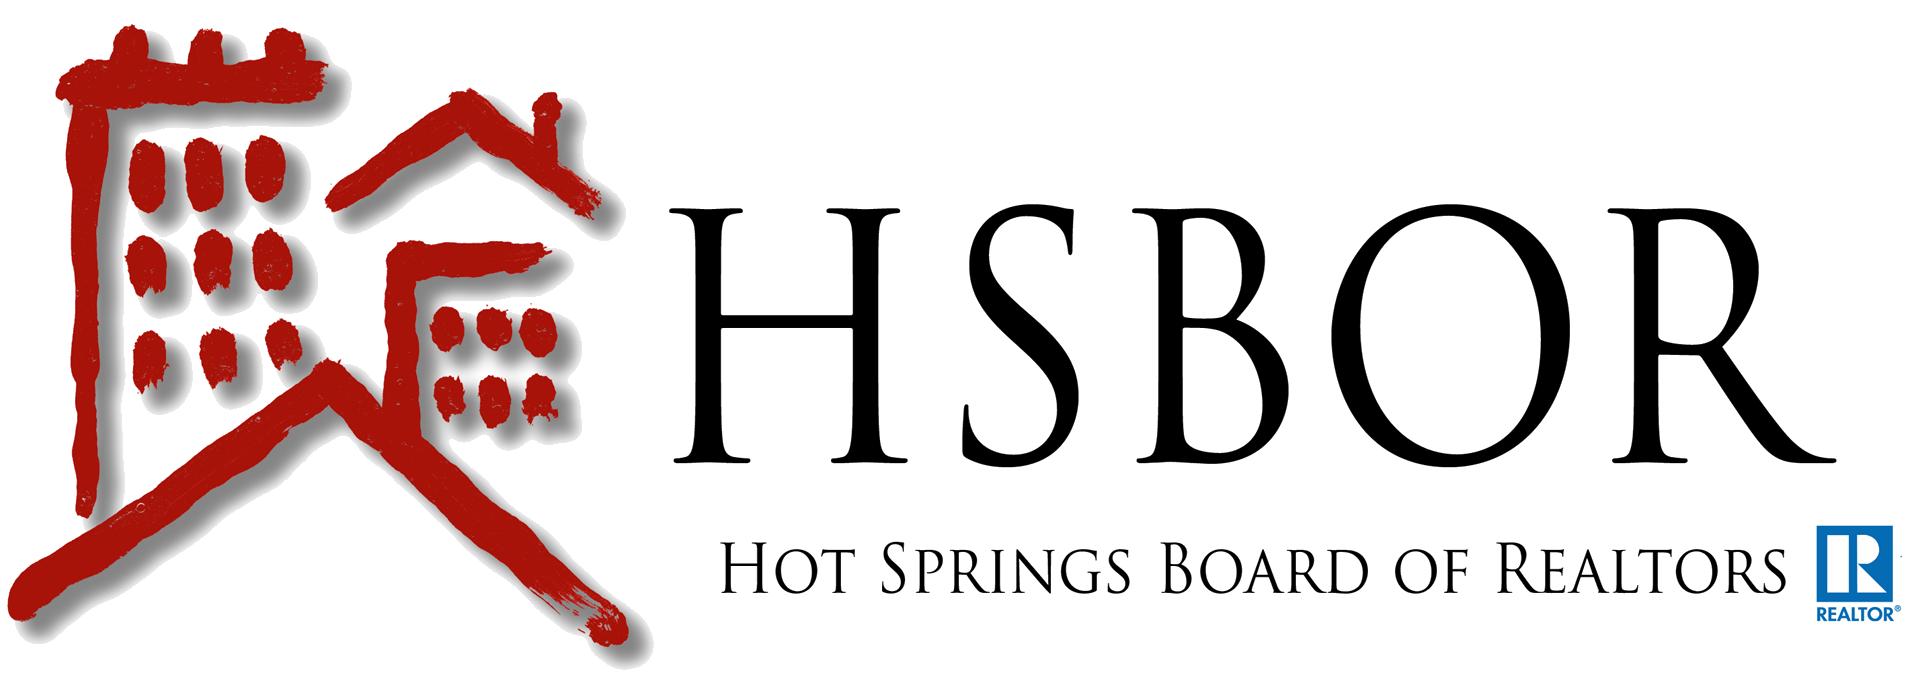 Hot Springs Board of Realtors | Terra Solutions